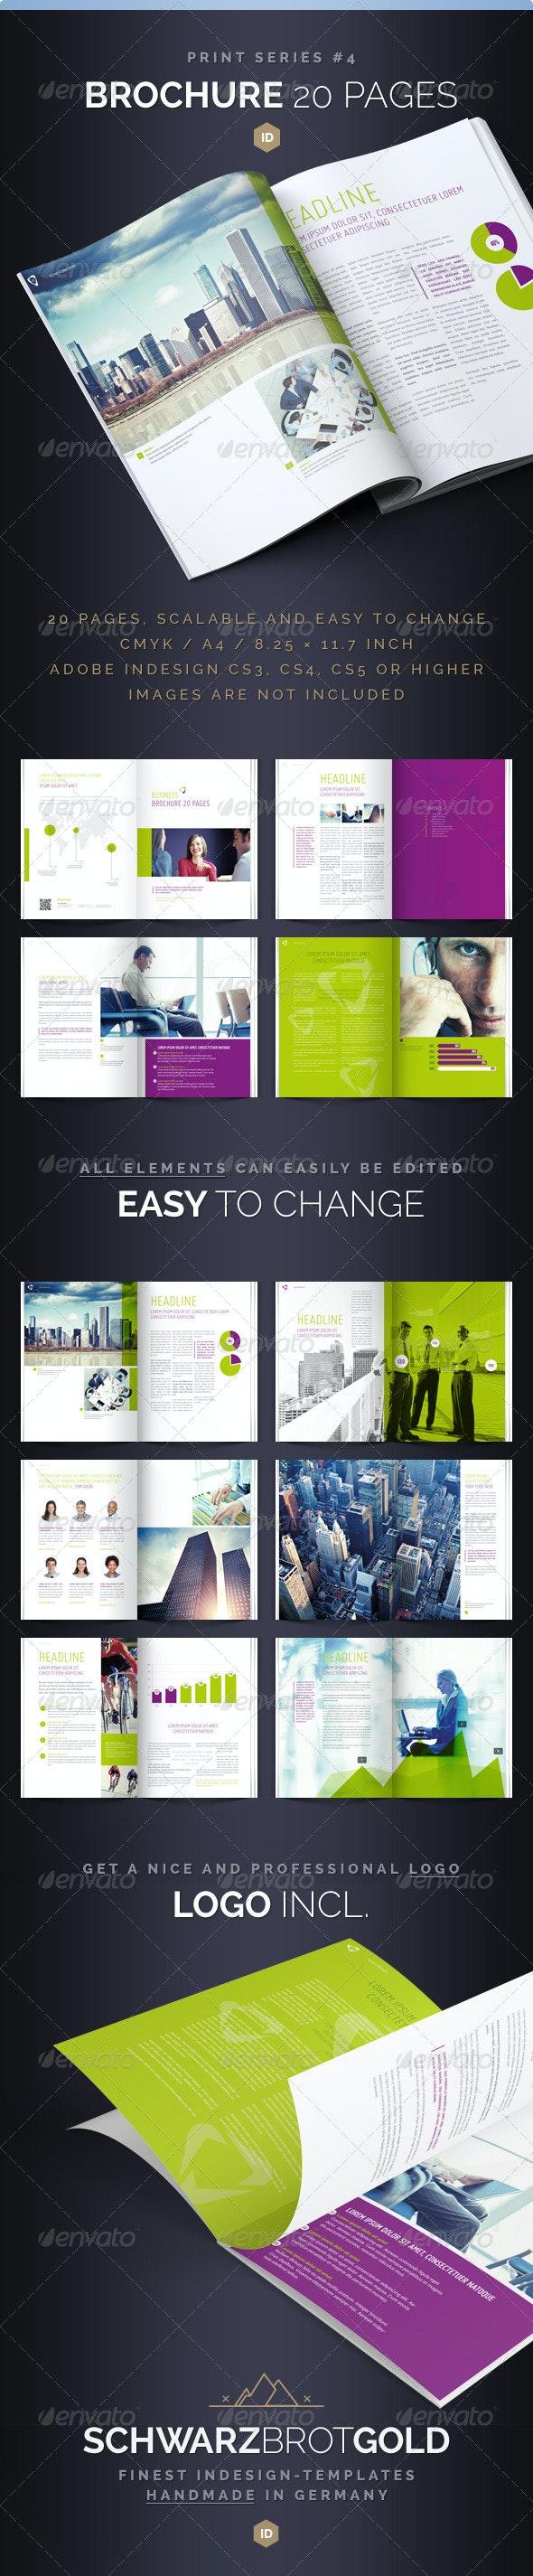 Brochure 20 Pages Series 4 - Corporate Brochures